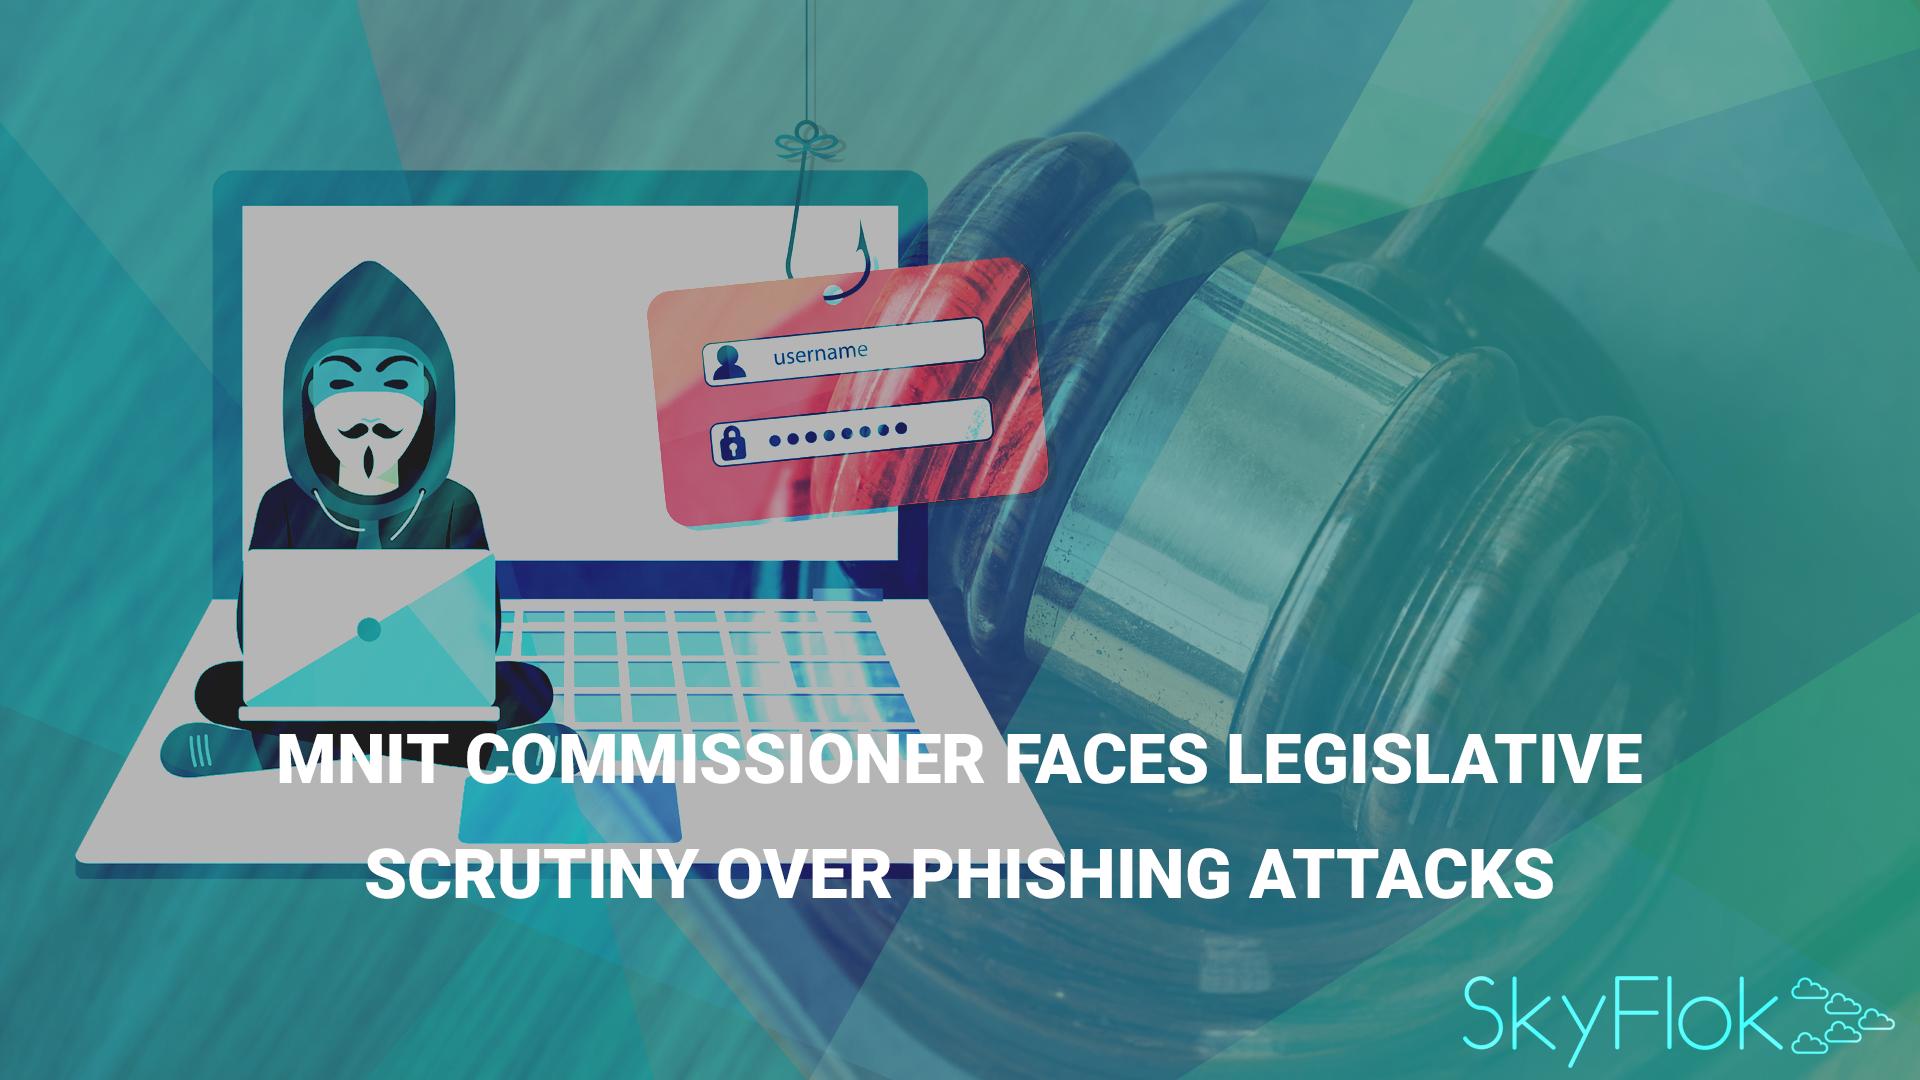 MNIT Commissioner Faces Legislative Scrutiny Over Phishing Attacks